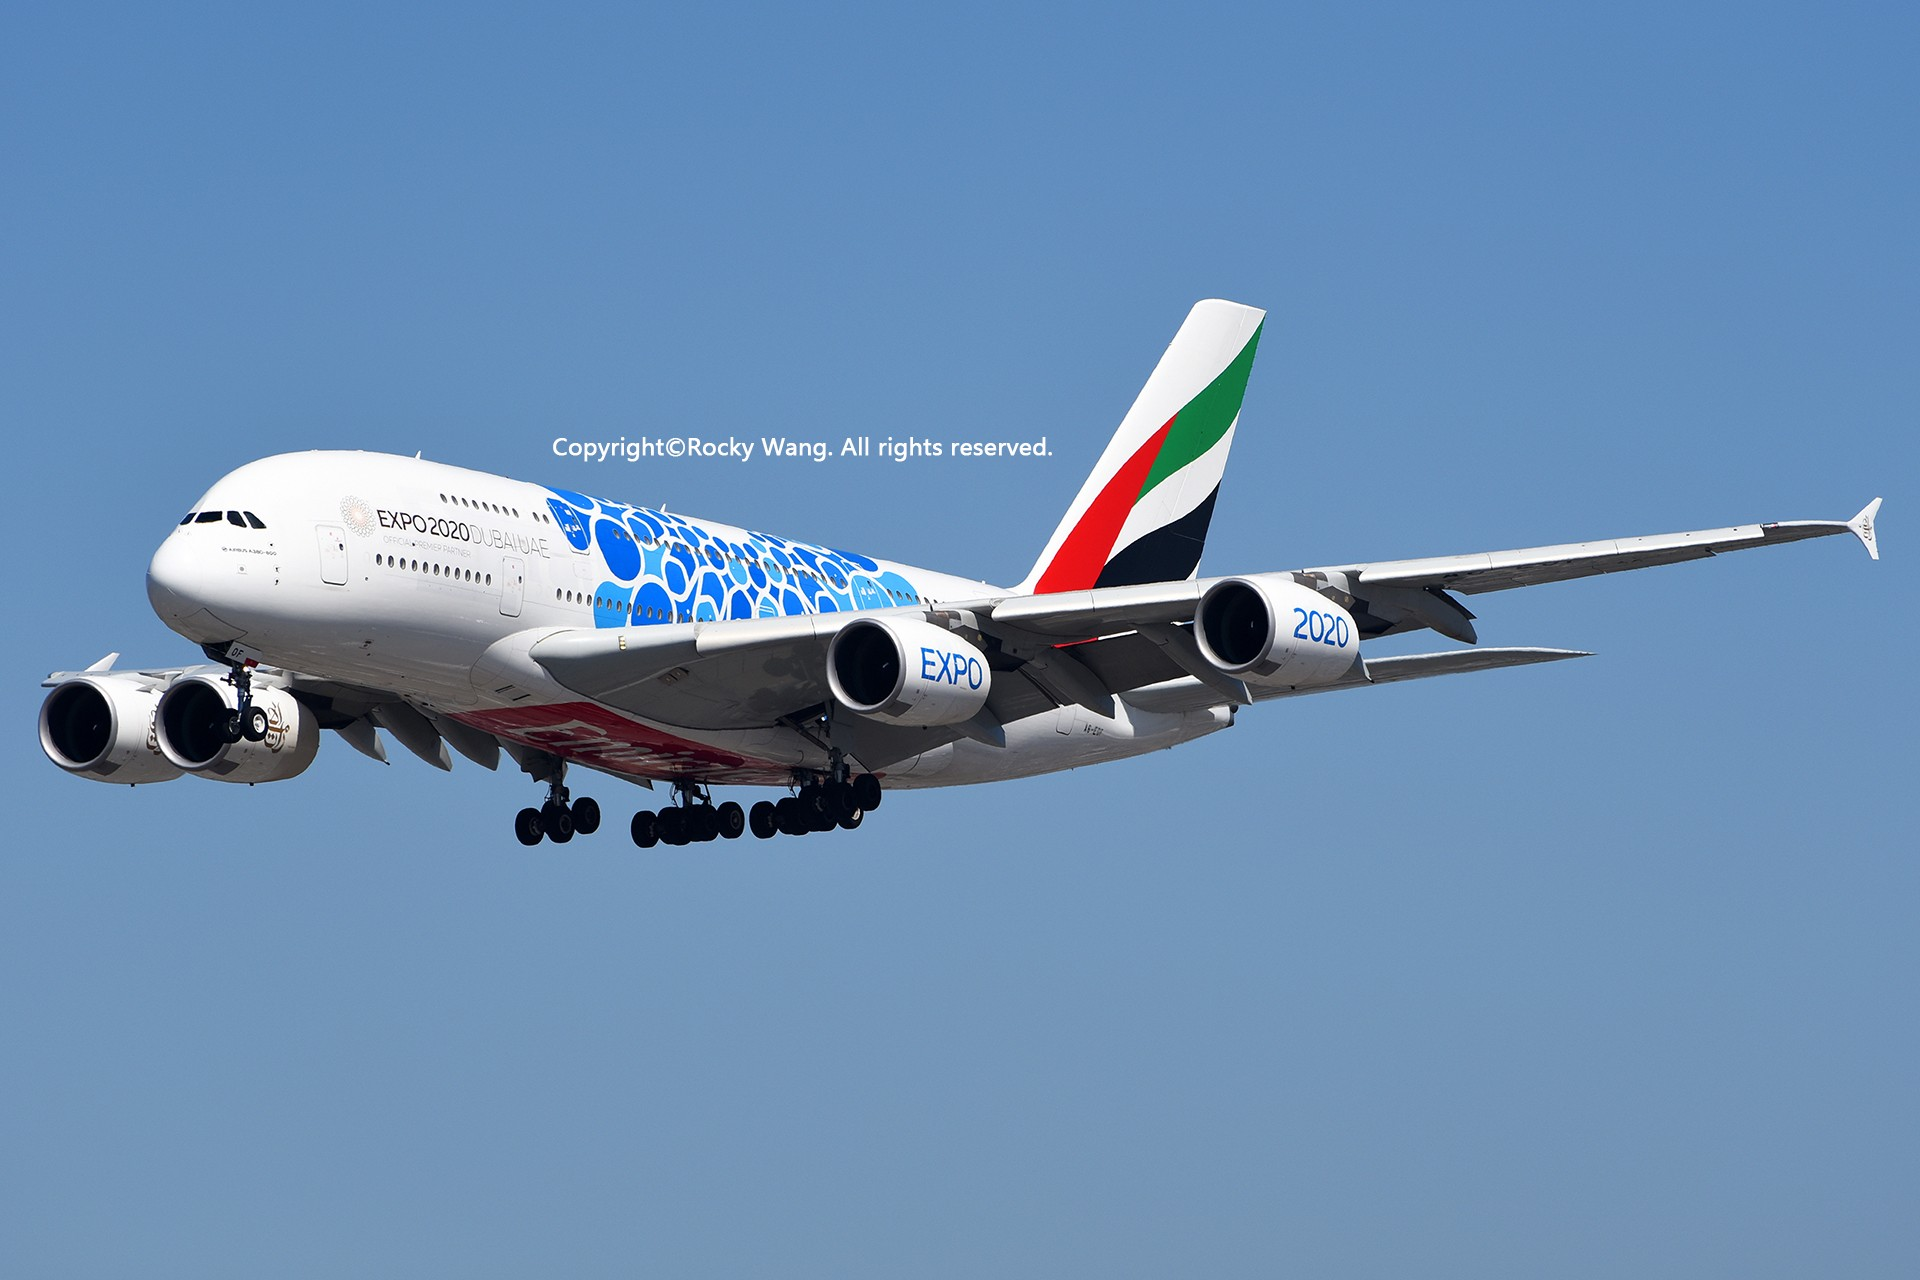 Re:[原创]彩绘圣地-附加彩蛋 AIRBUS A380-861 A6-EOF Los Angeles Int'l Airport